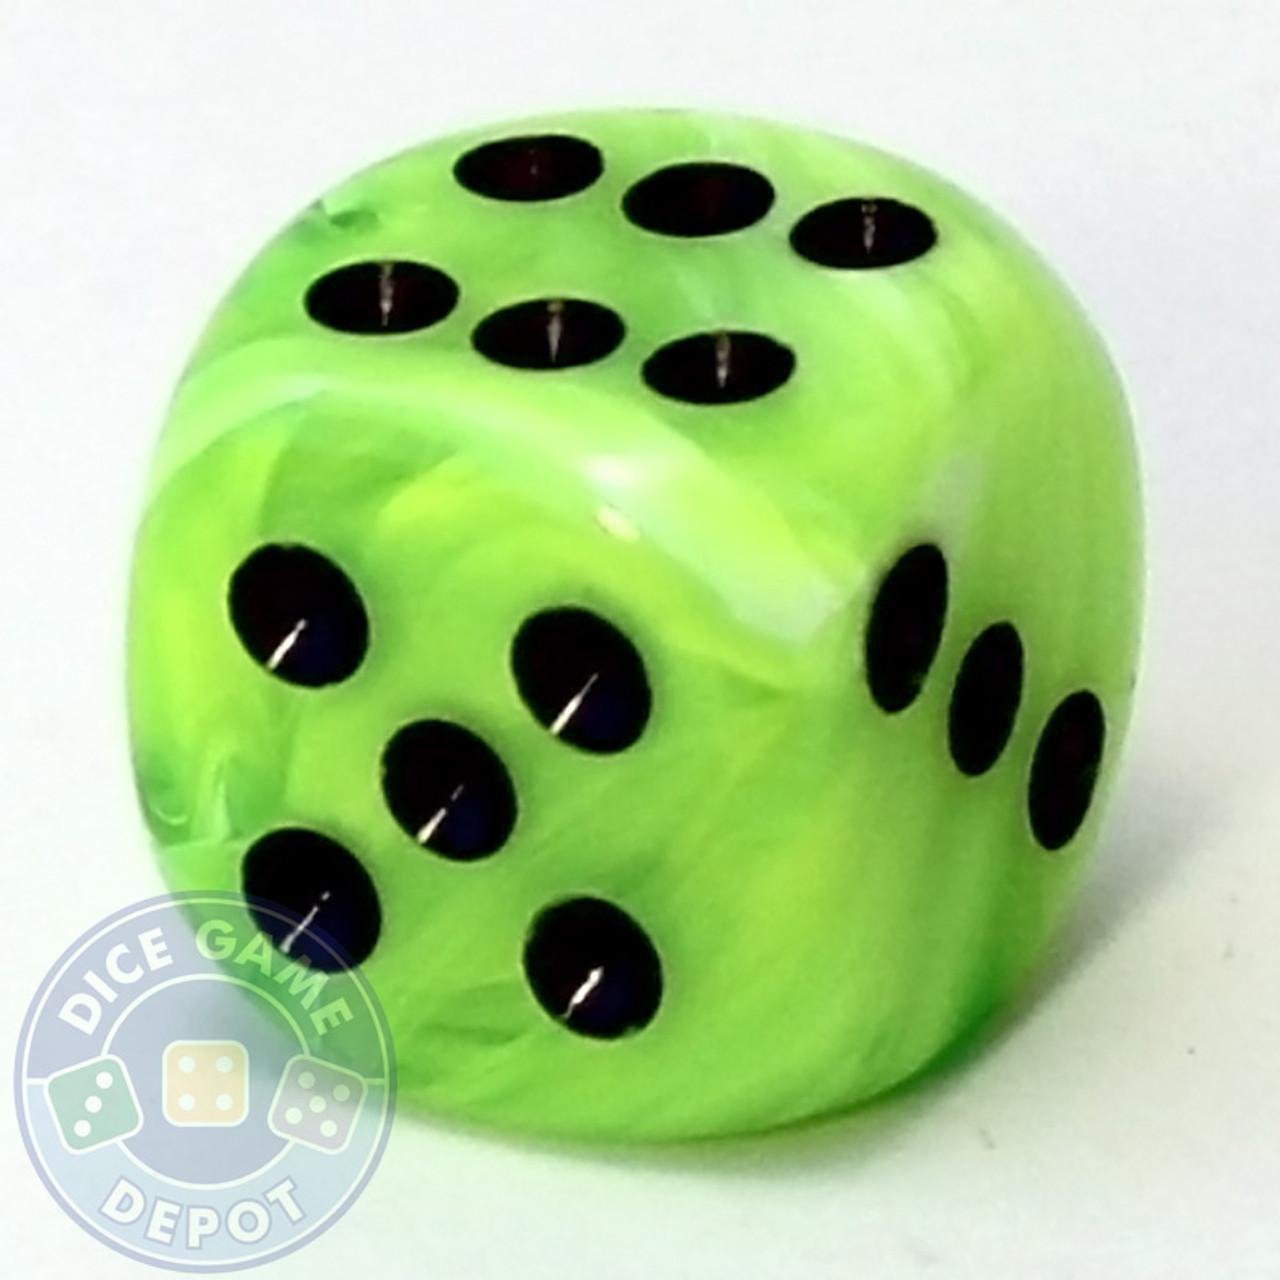 Vortex Dice - Bright Green 16mm d6